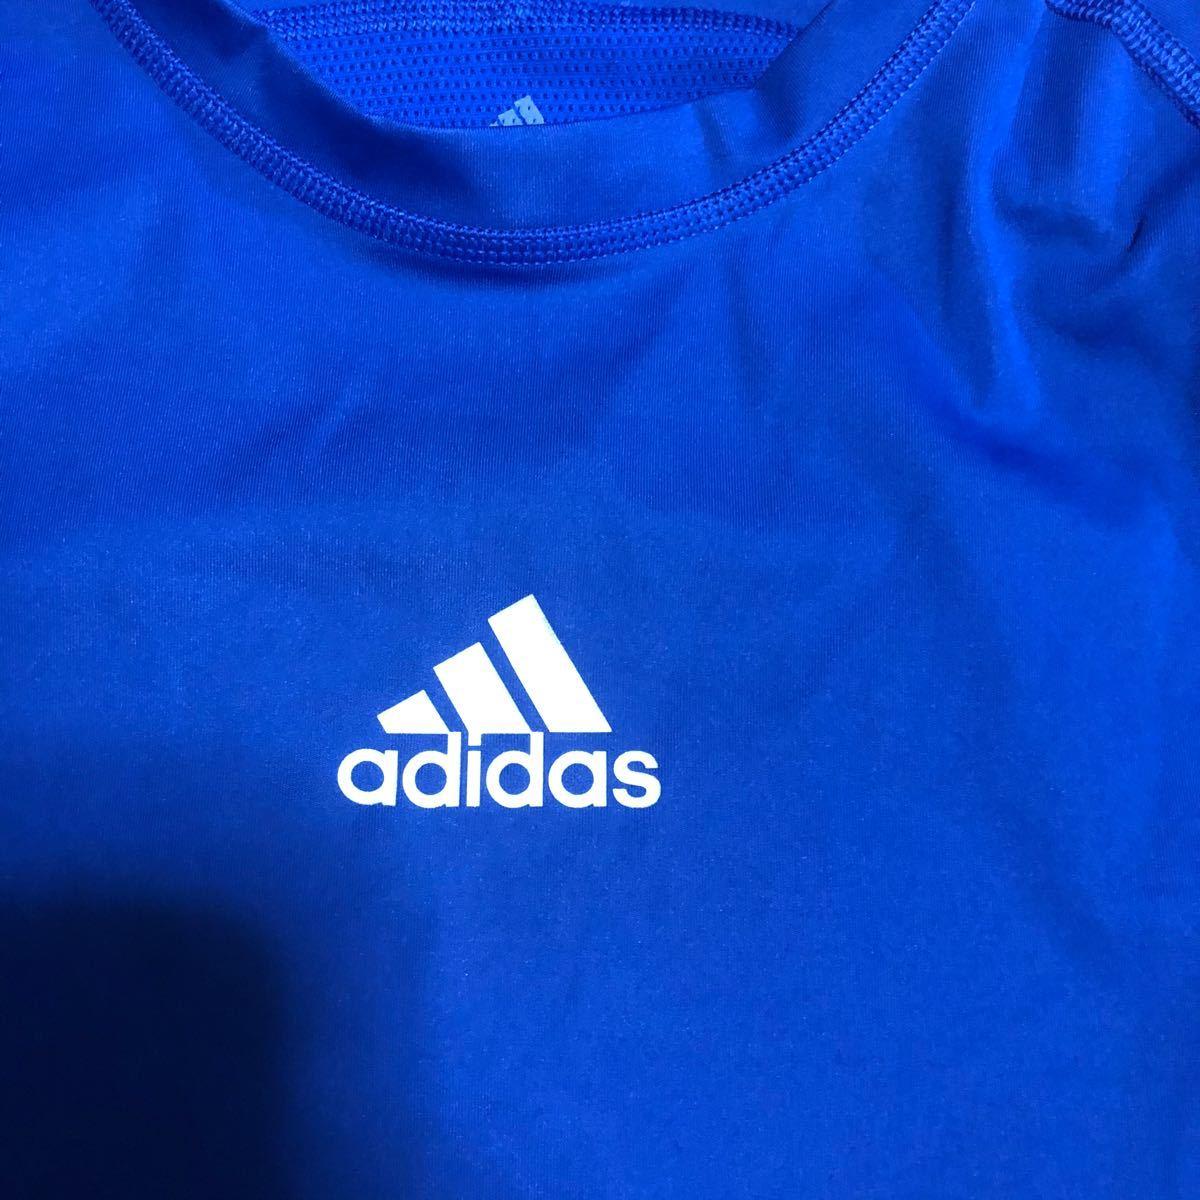 adidas アディダス techfit アンダーシャツ 青 ロゴ コンプレッションシャツ tシャツ 半袖 climacool